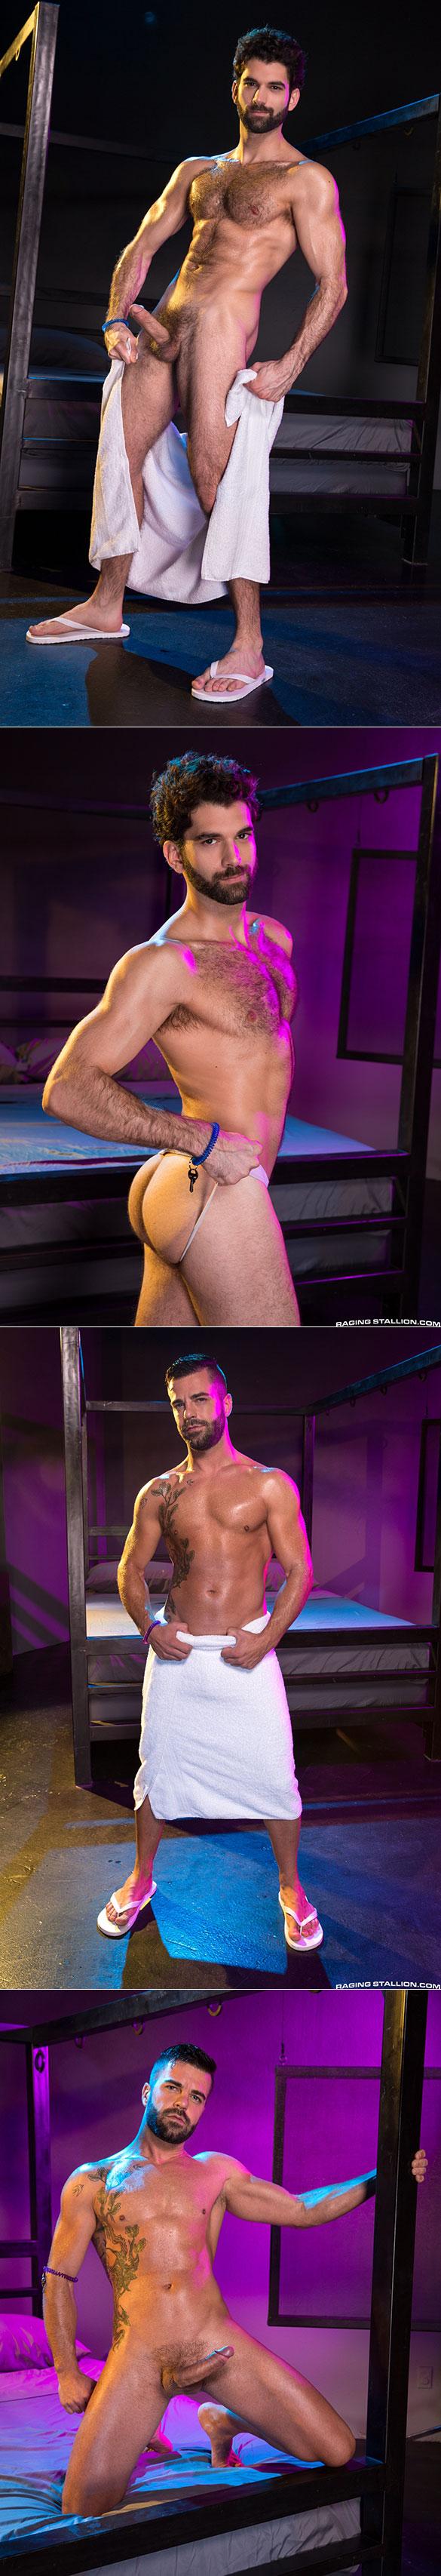 "Raging Stallion: Hector de Silva bangs Tegan Zayne in ""Clothing Optional"""